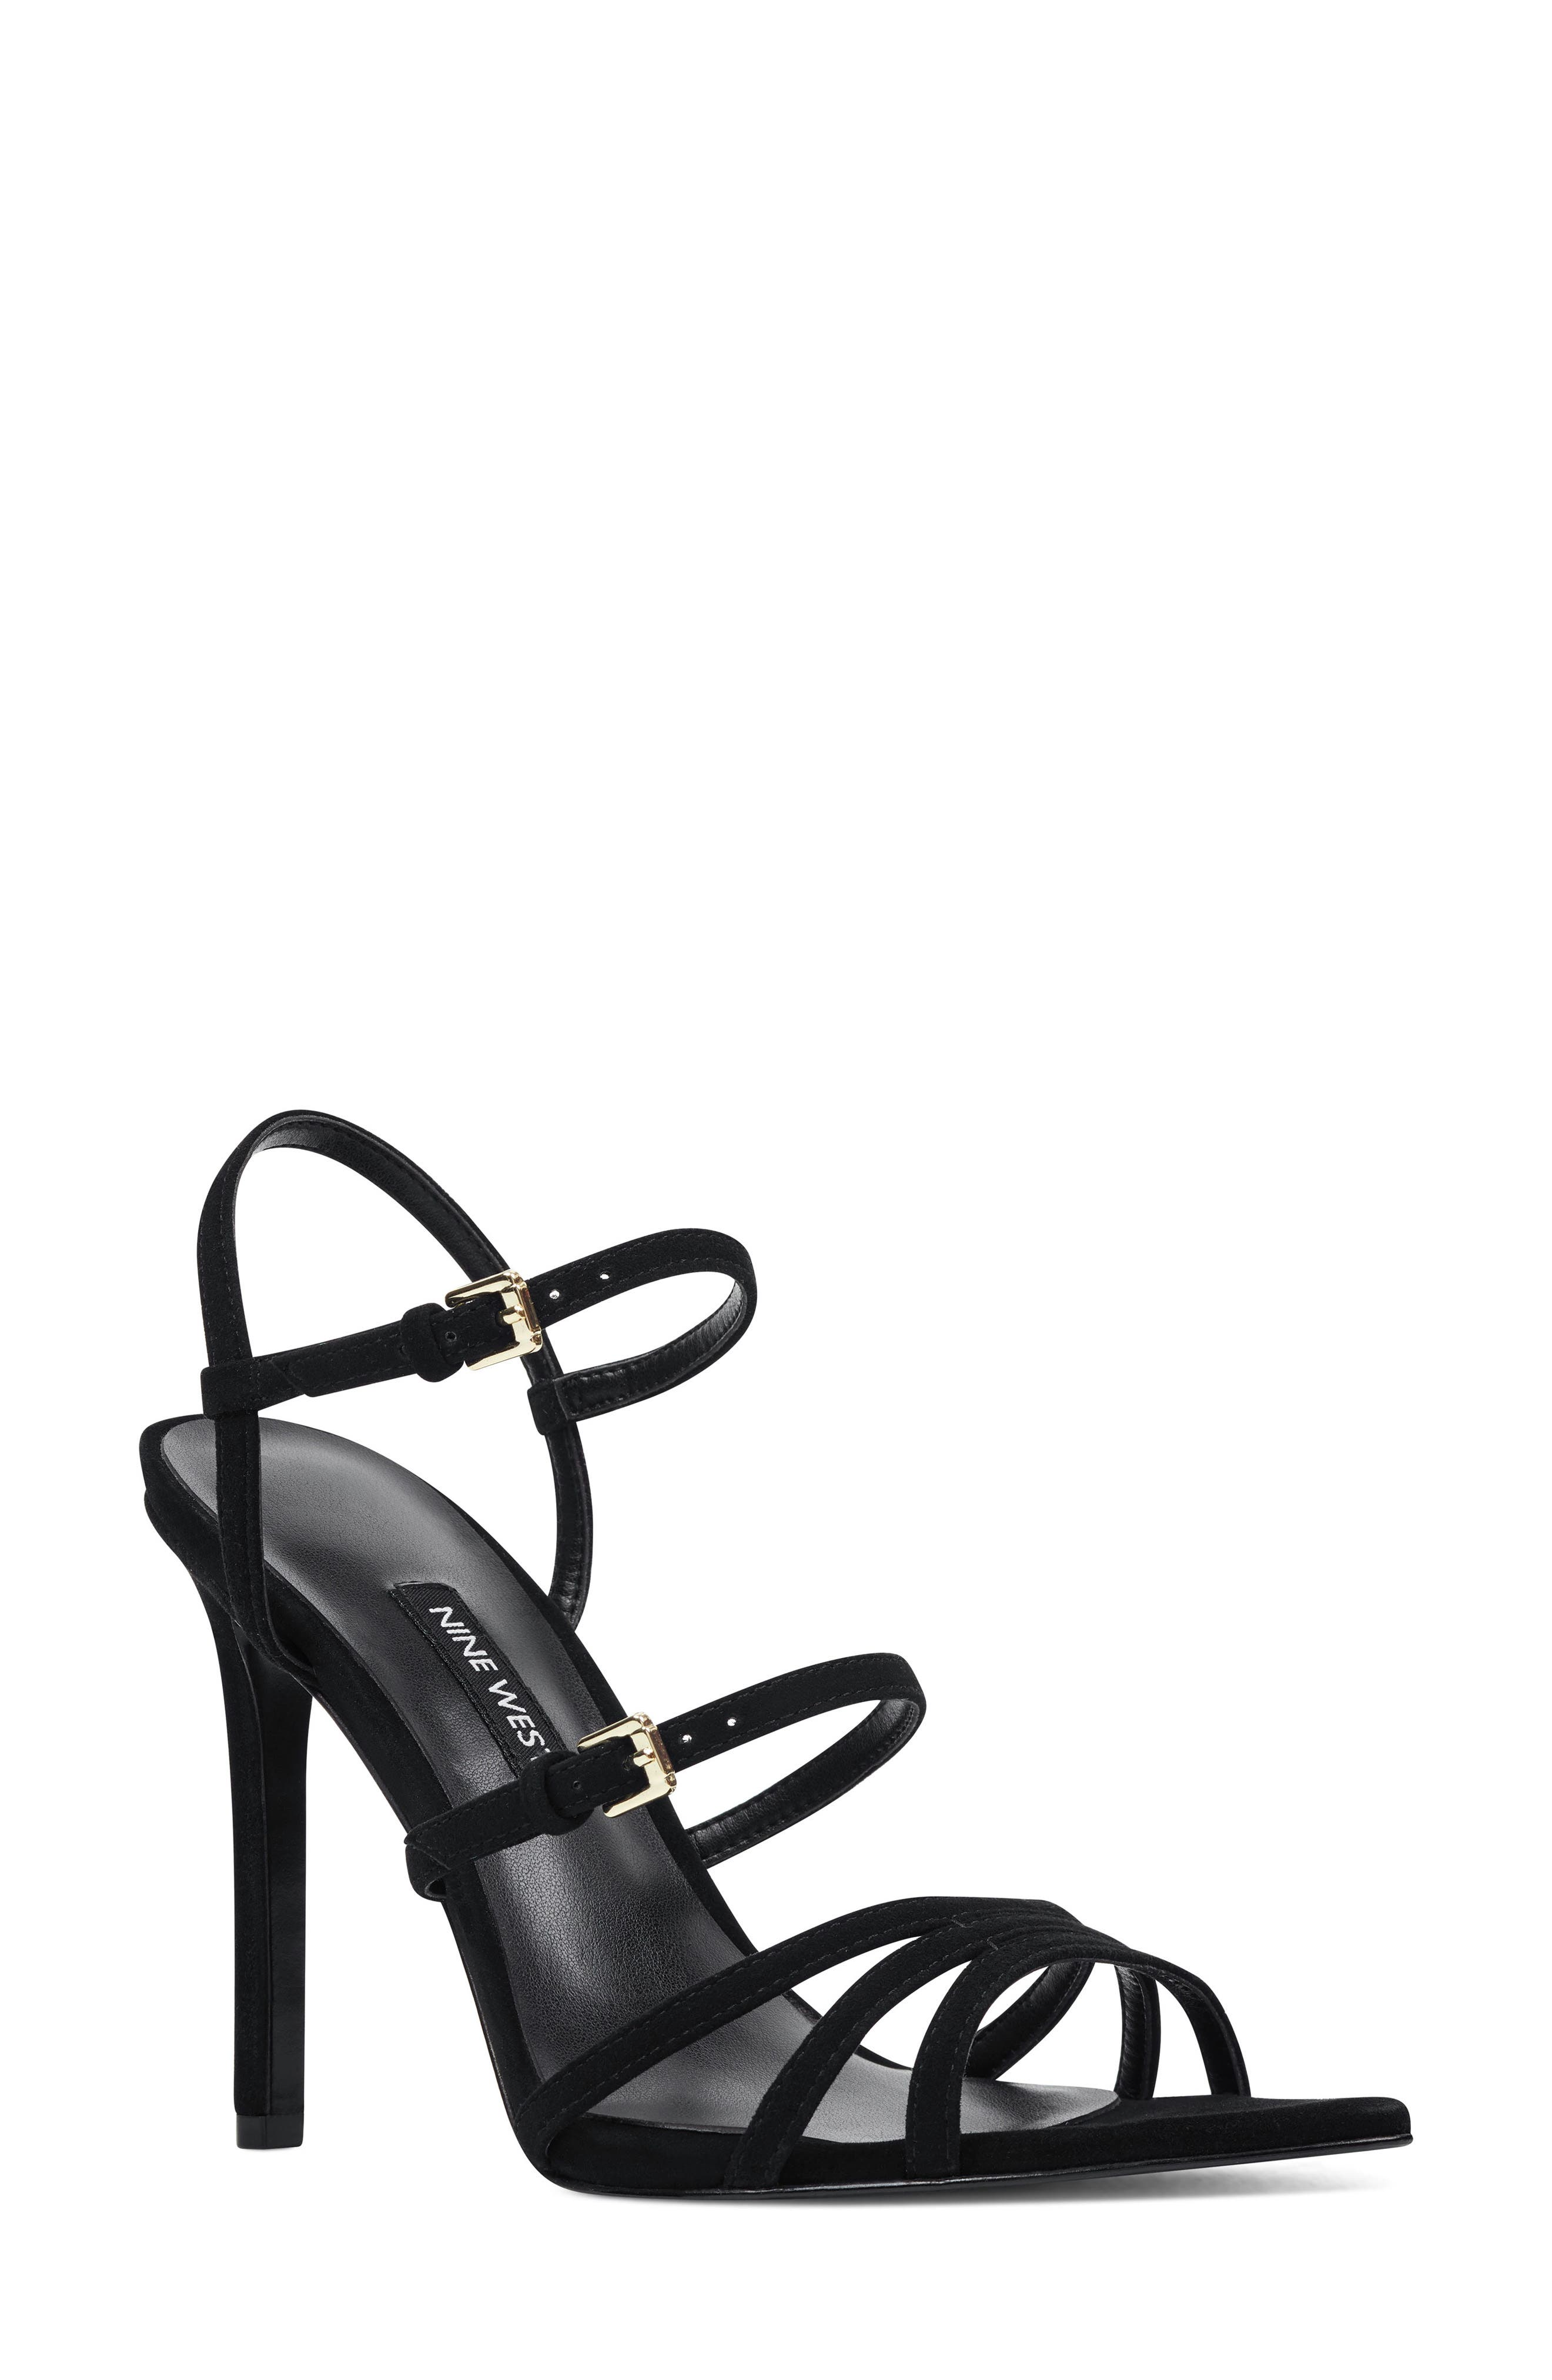 Nine West Gilficco Strappy Sandal- Black